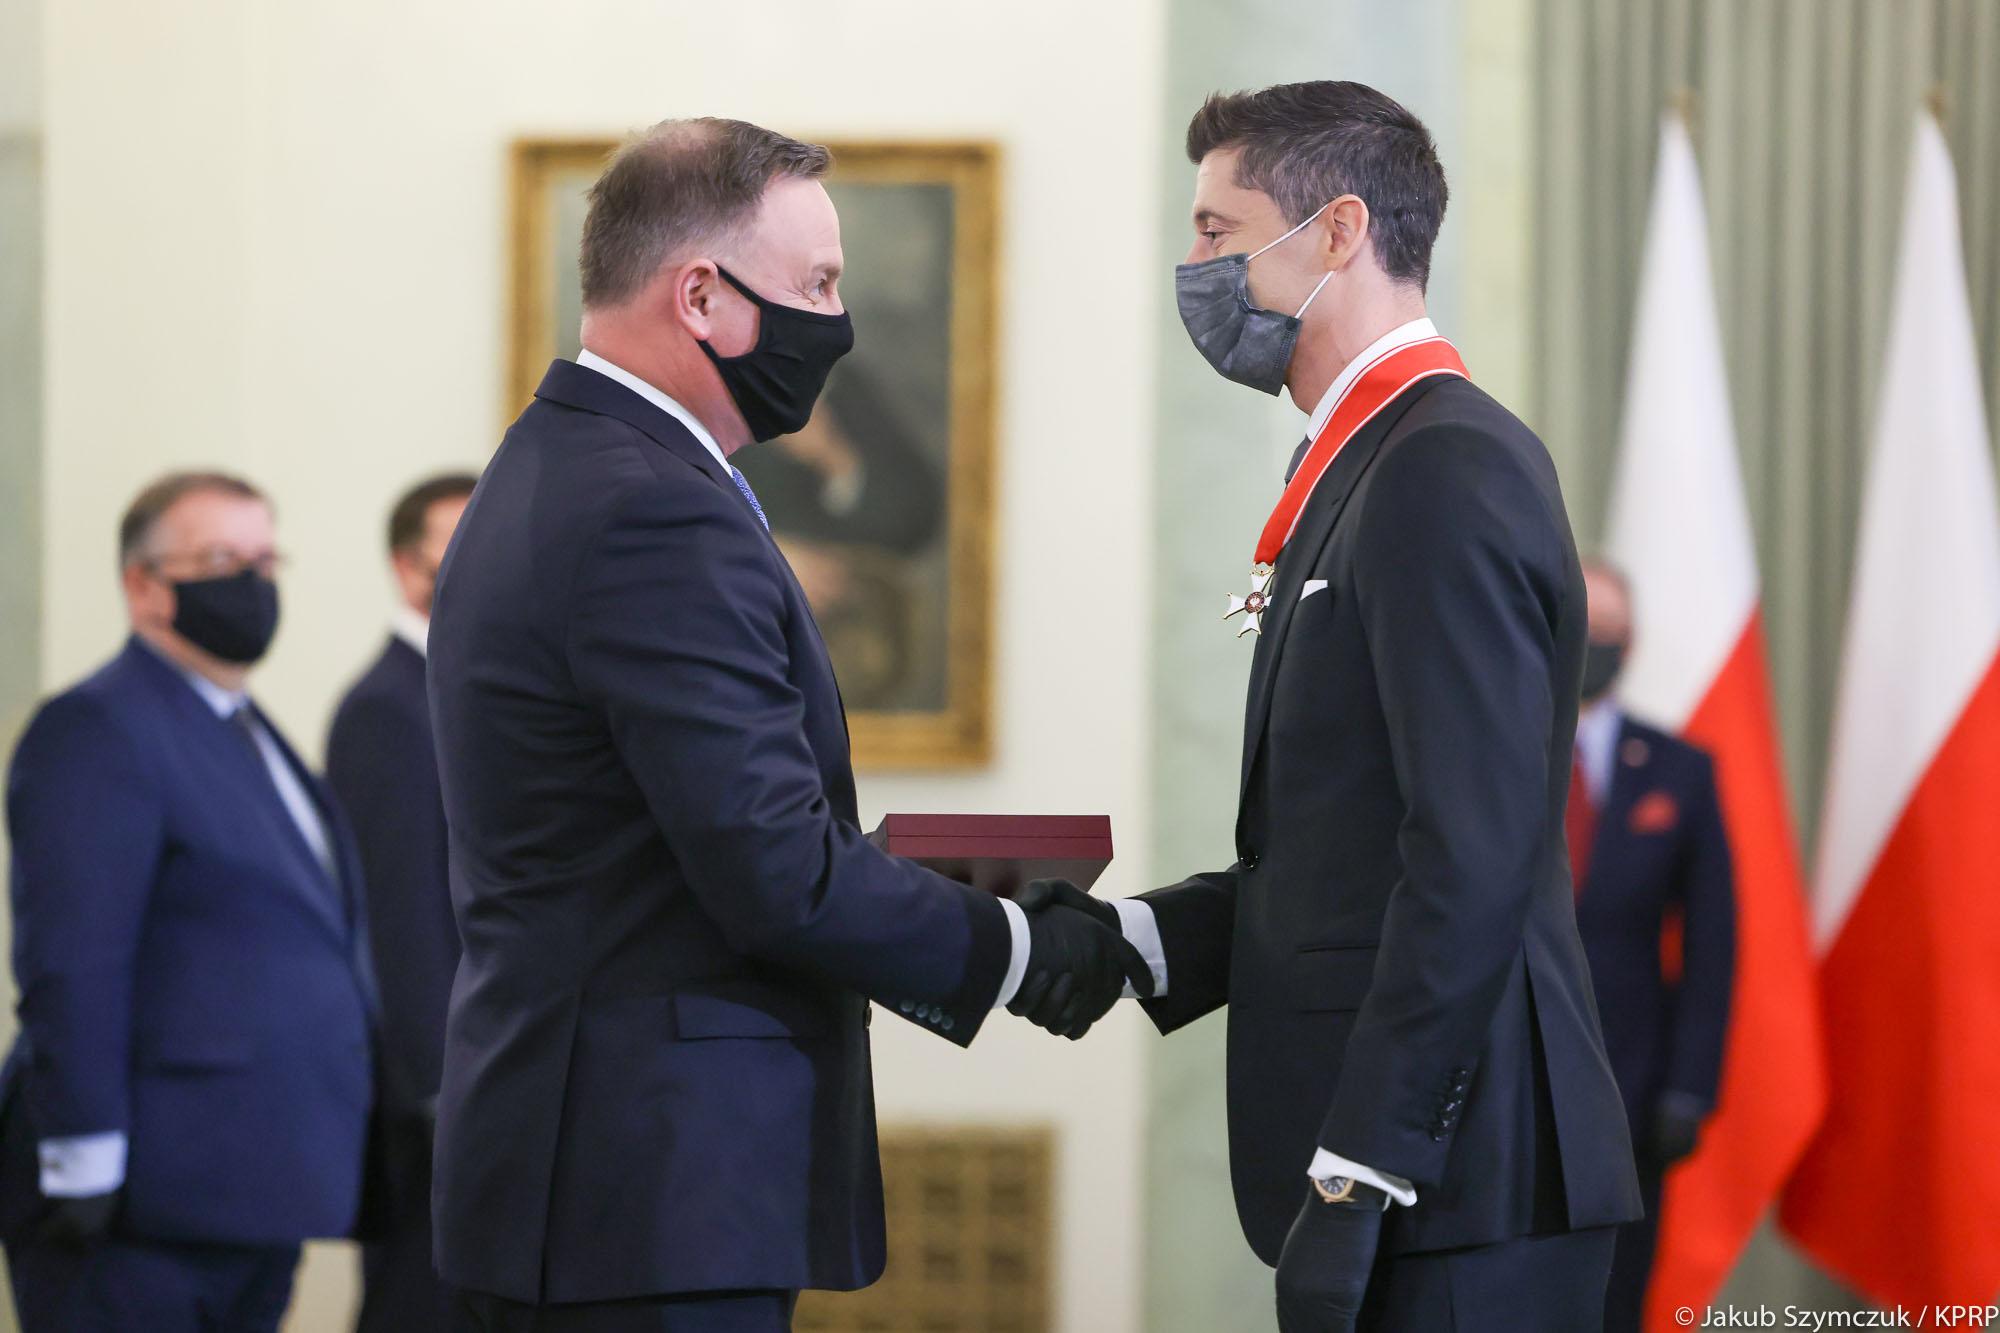 robert lewandowski odznaczony  - Jakub Szymczuk/KPRP